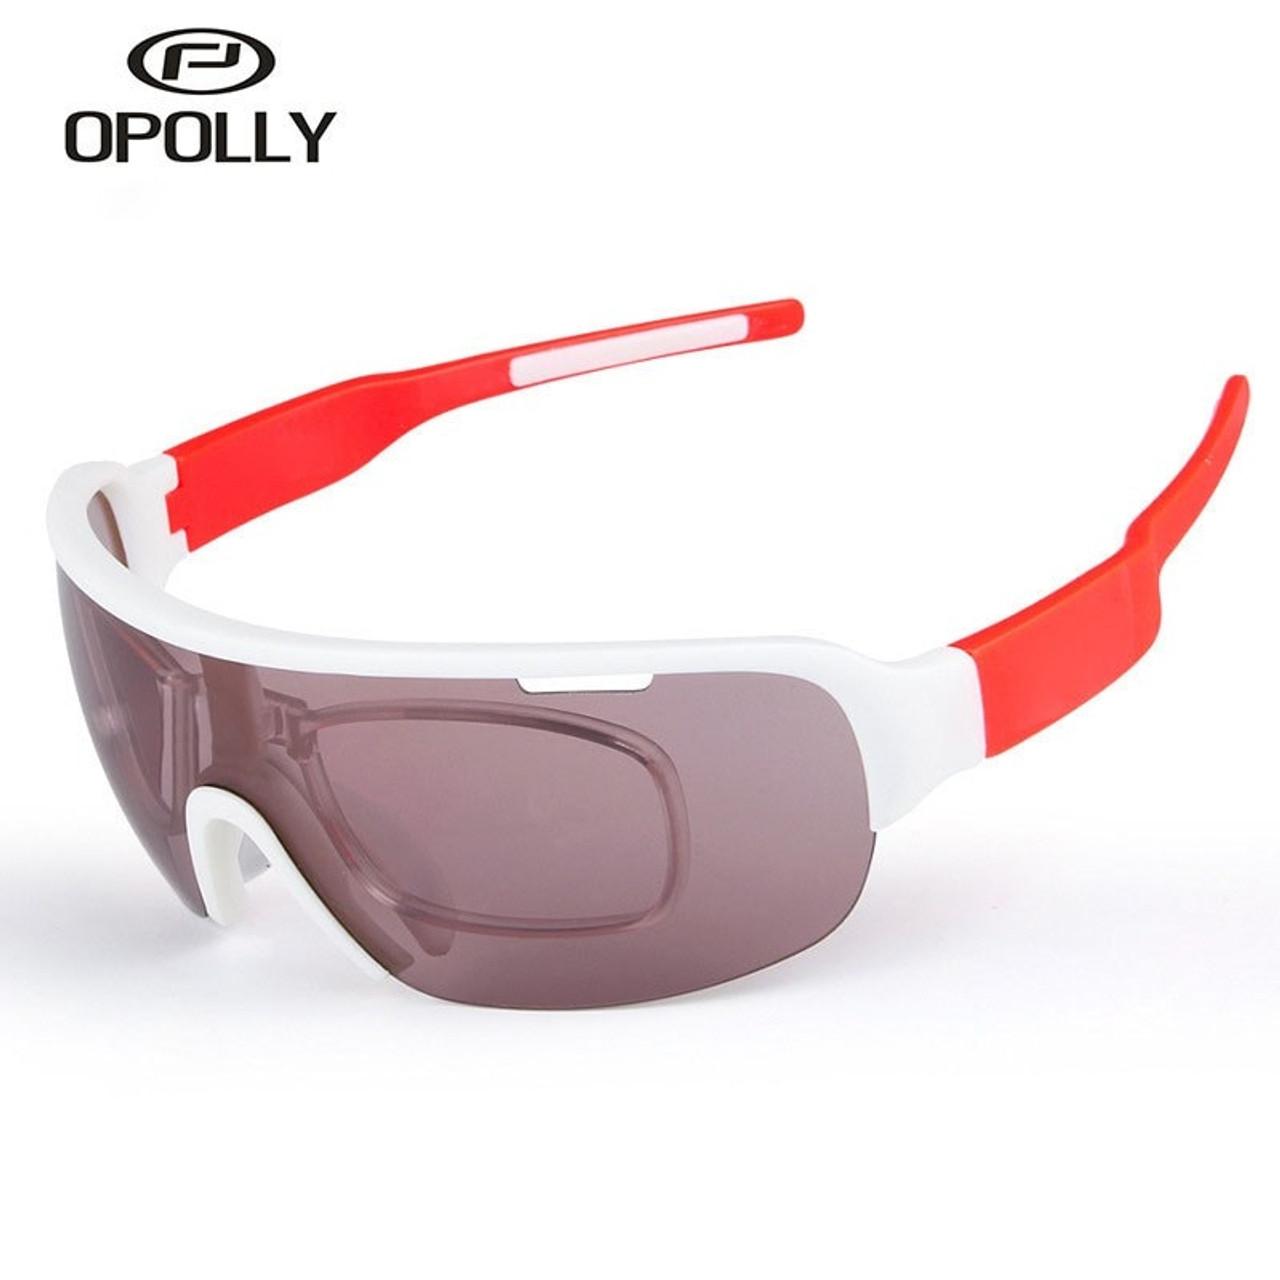 e75cb806689f ... Cycling SunGlasses Polarized Cycling Glasses Myopia Mountain Bike  Goggles 2018 Cycling Eyewear Bicycle Sunglasses 5 Lens ...